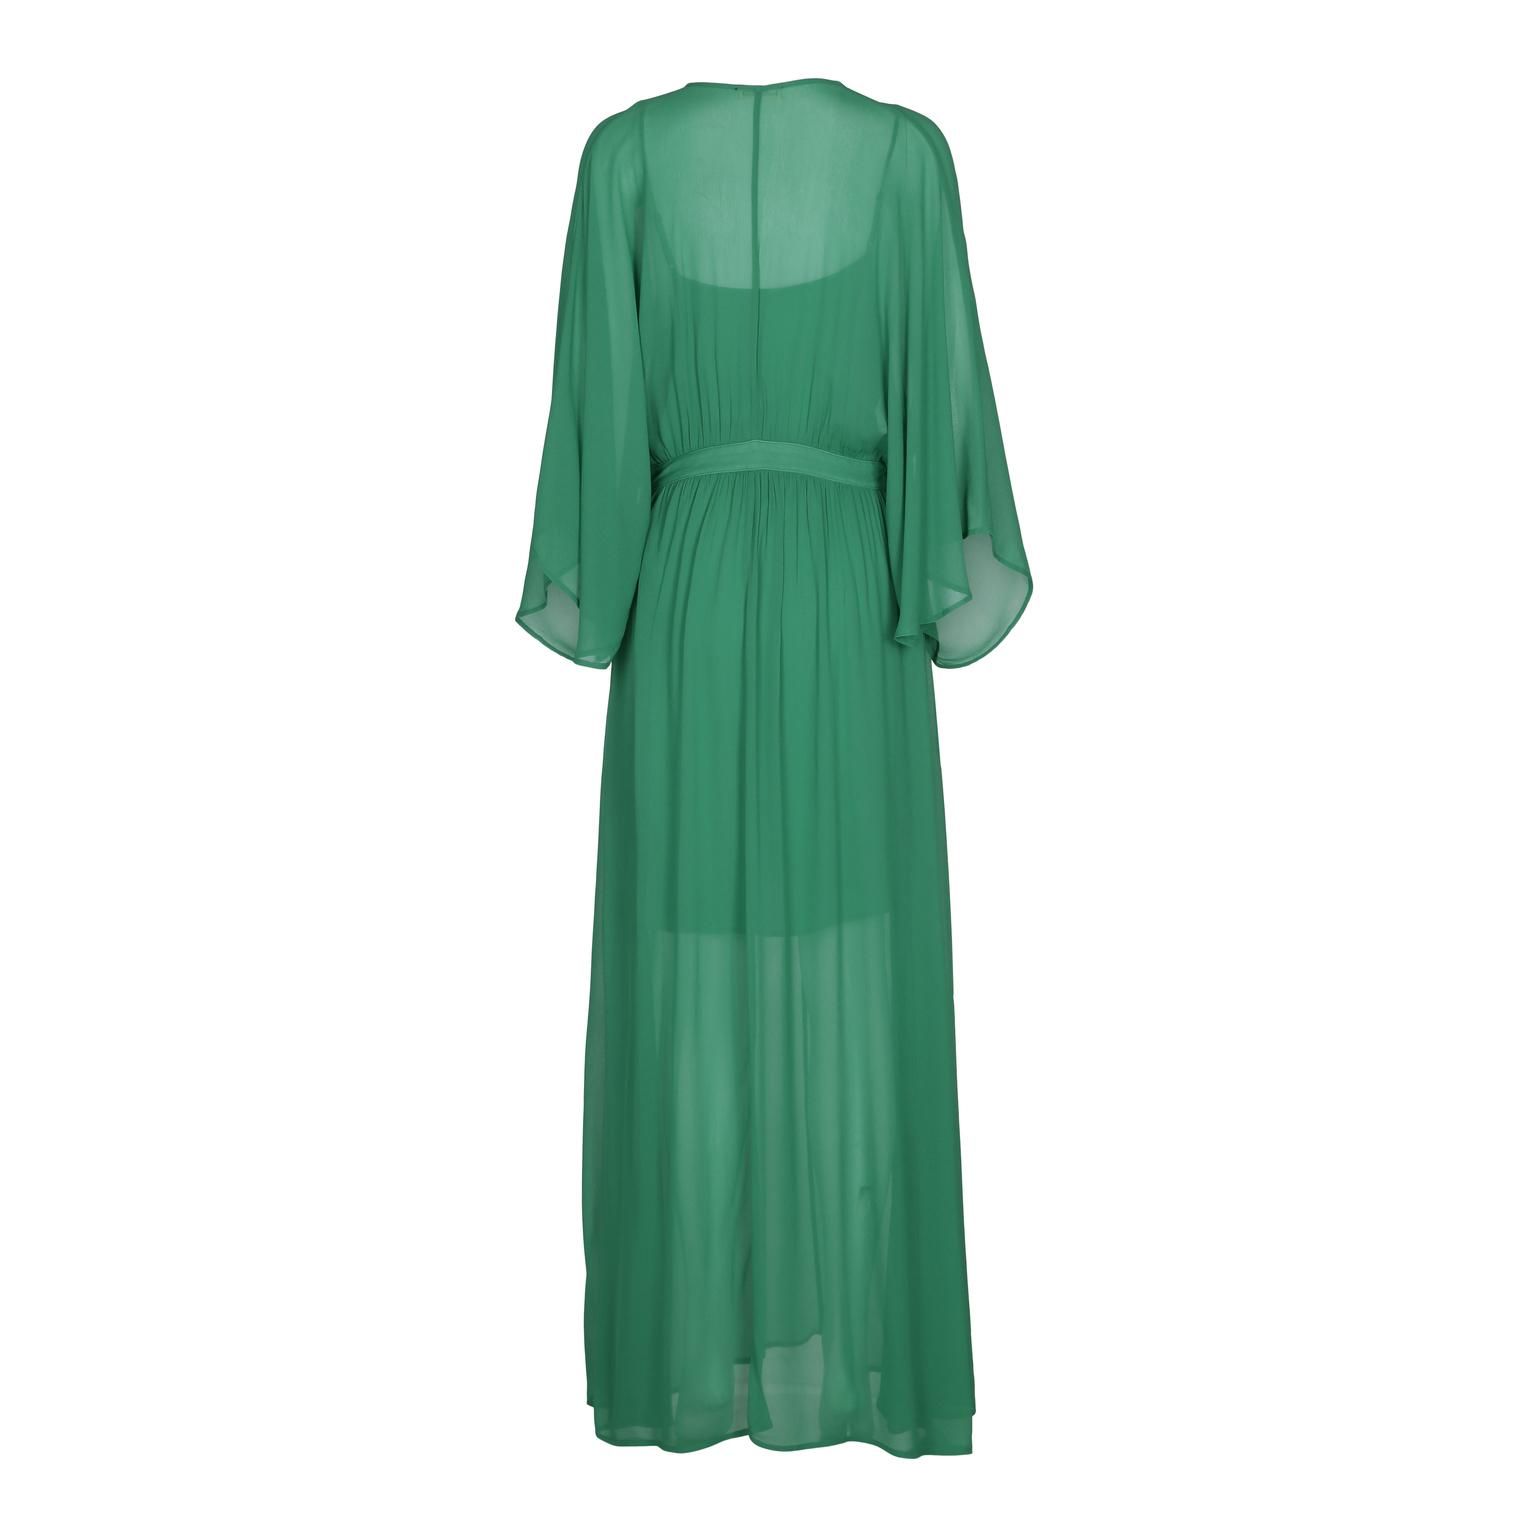 Custommade Green Glenna Dress